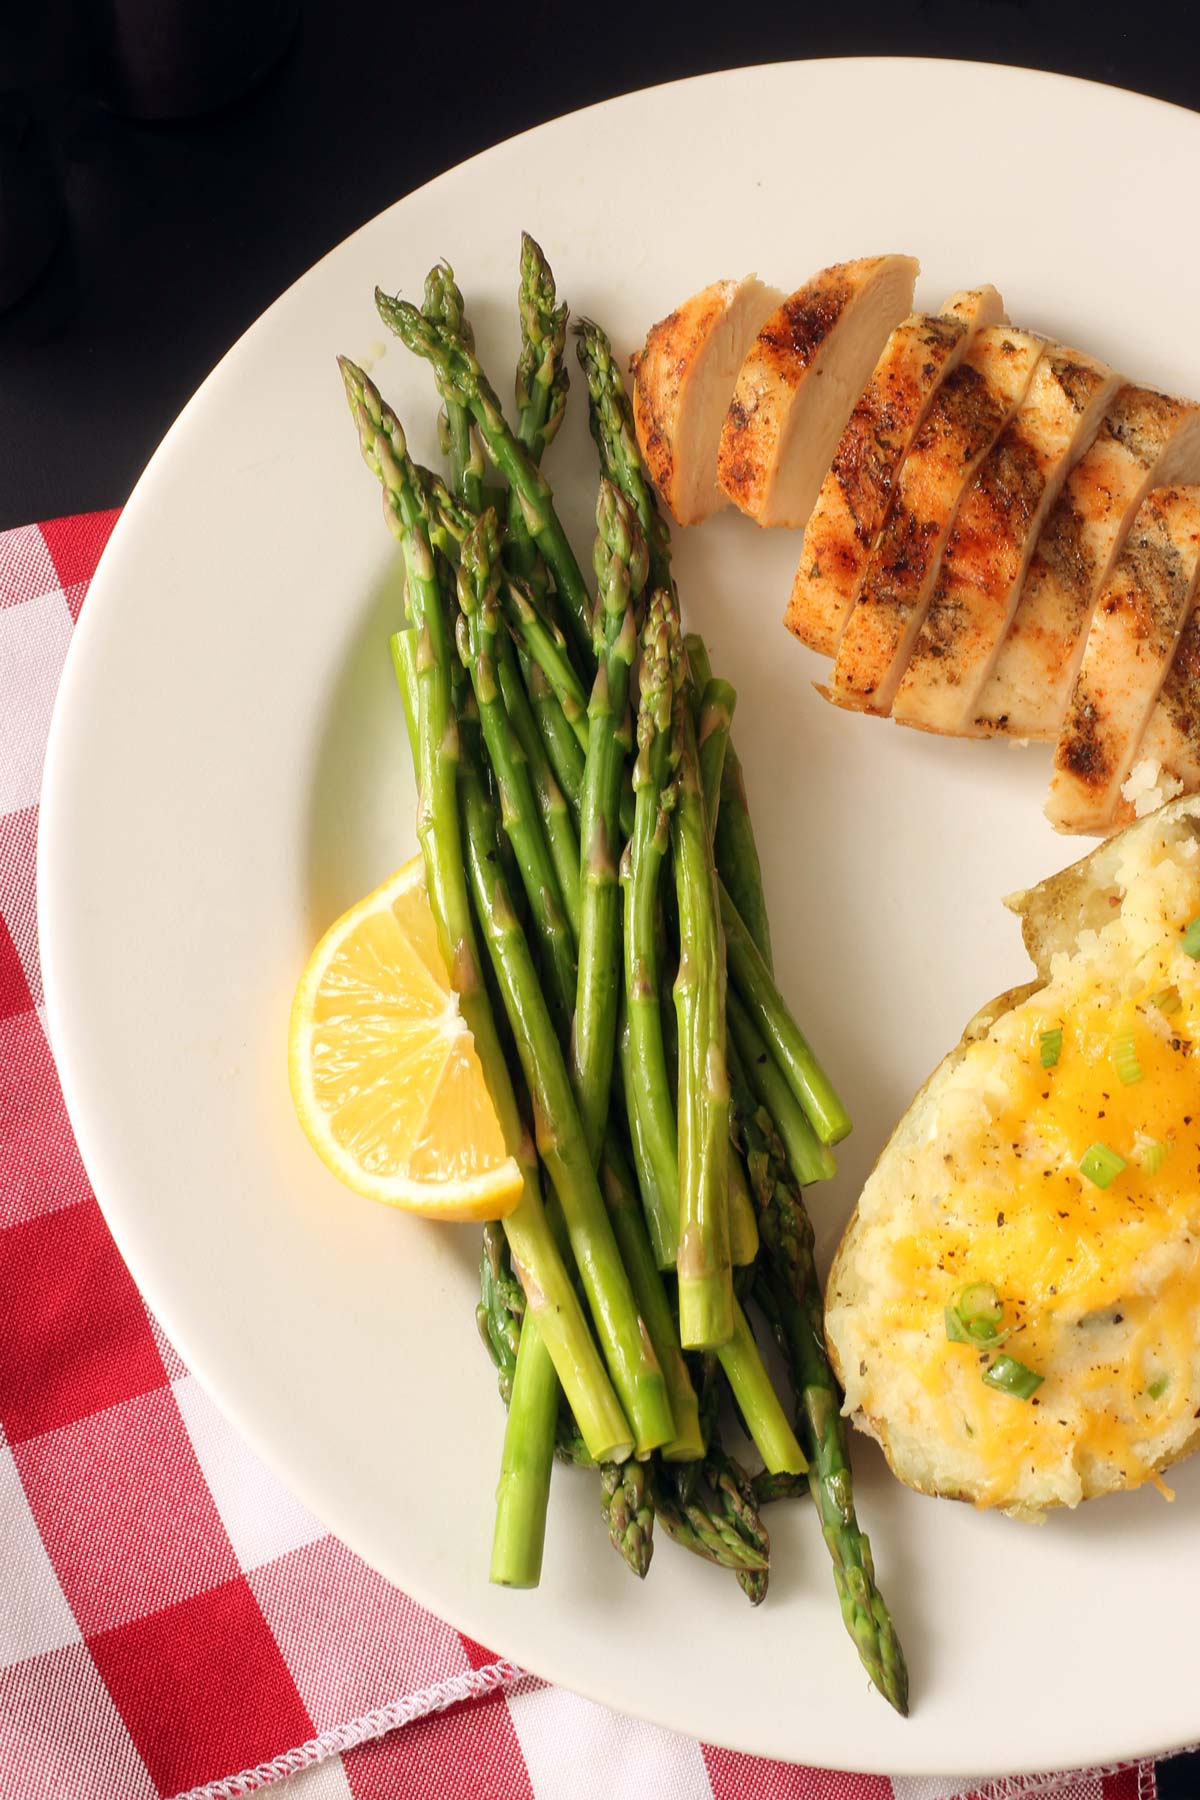 asparagus and lemon on dinner plate